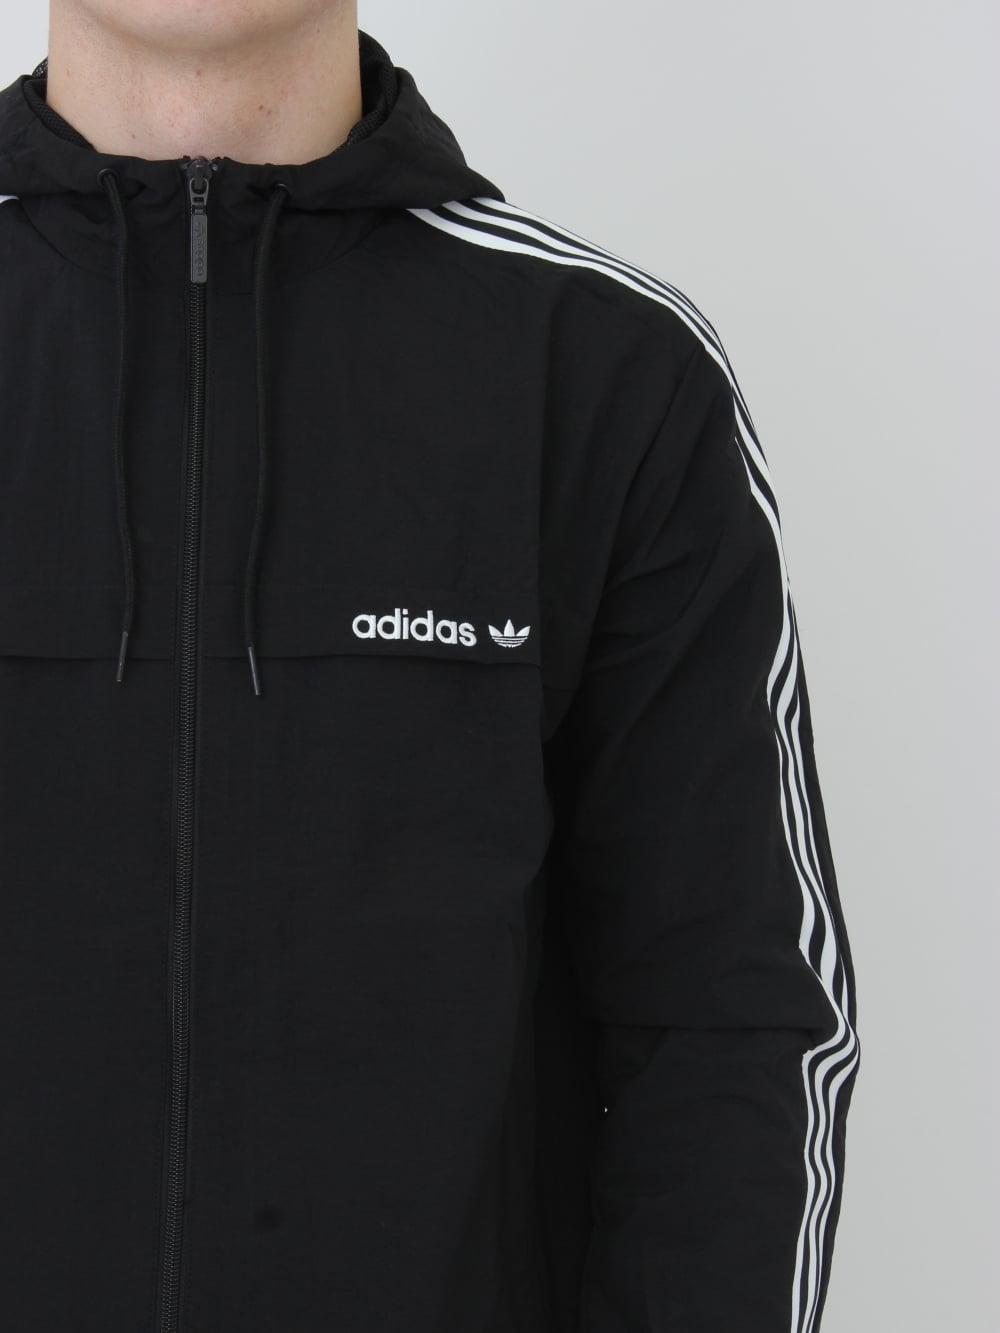 adidas originals windbreaker black